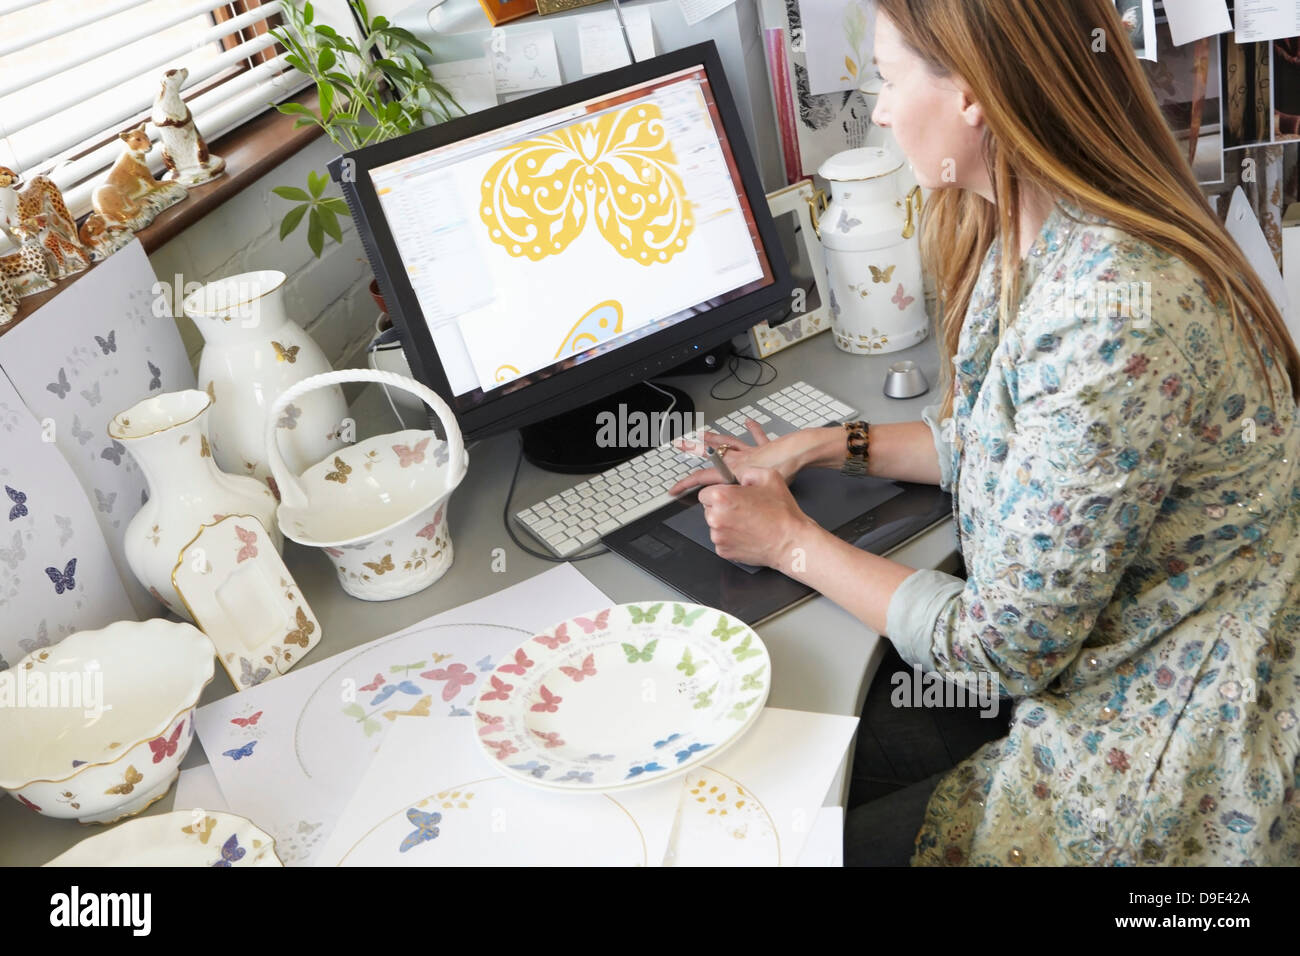 Ceramics designer working on computer - Stock Image